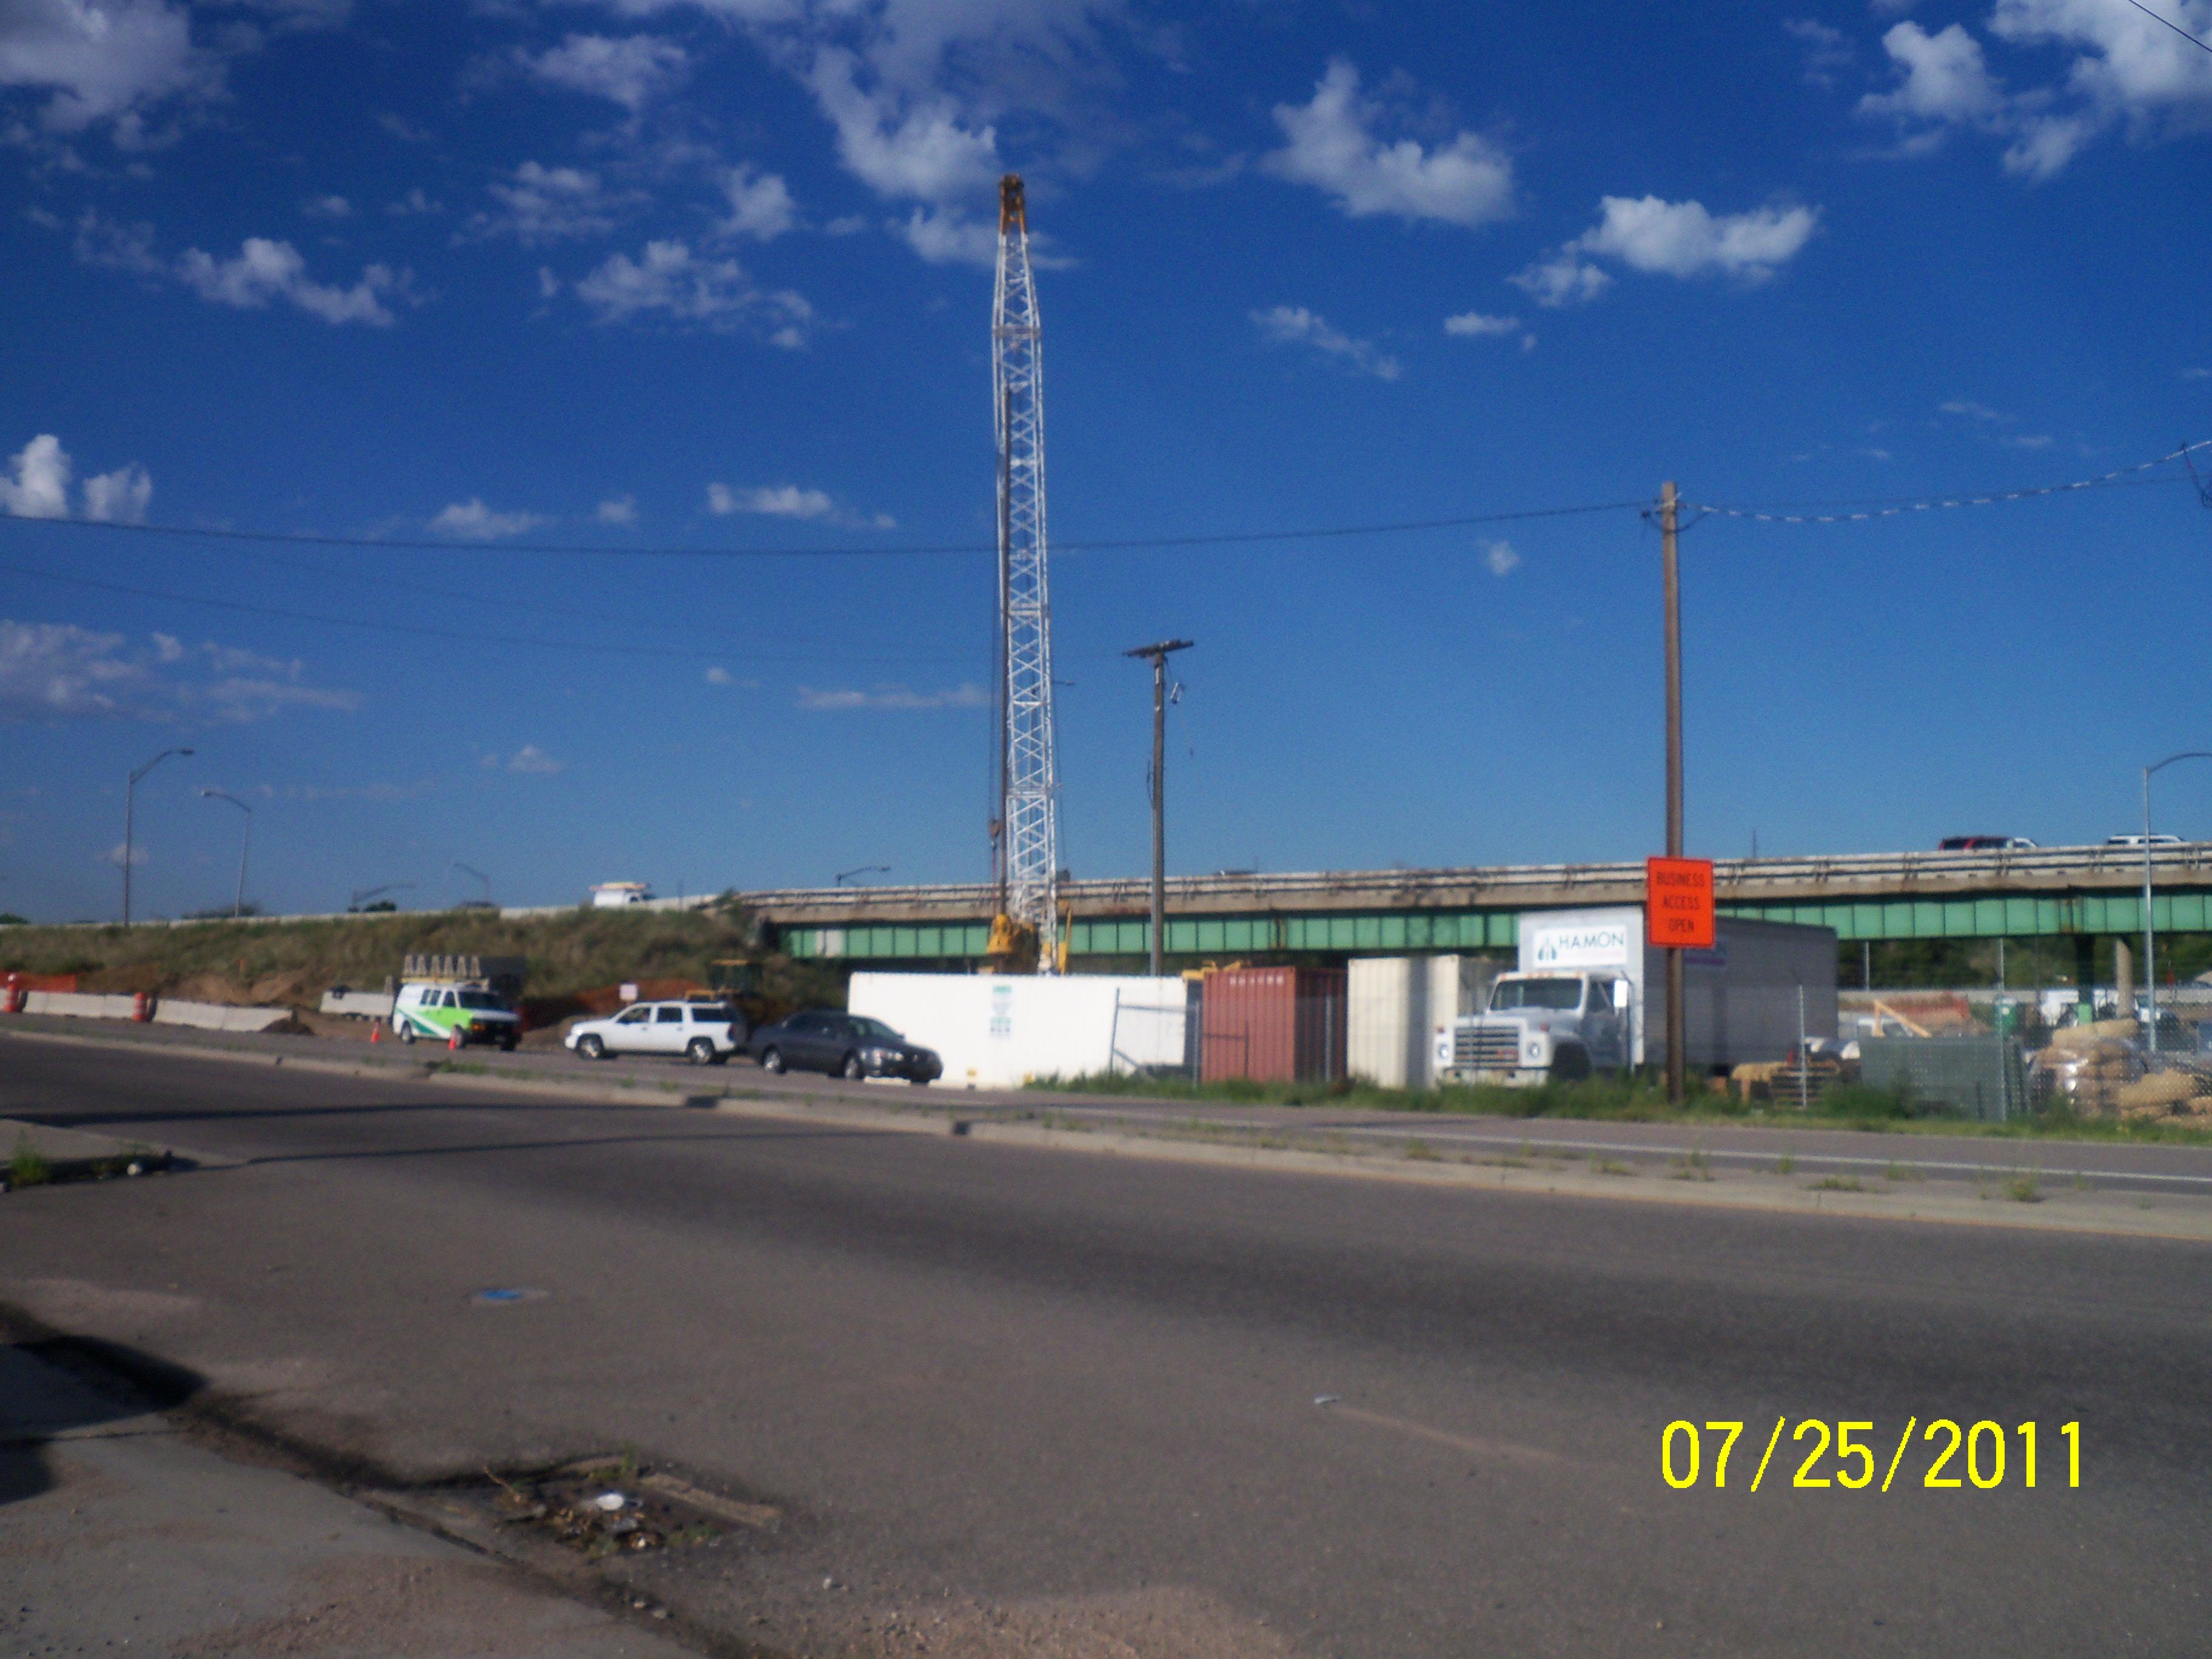 I-25 Santa Fe Pic 2 detail image